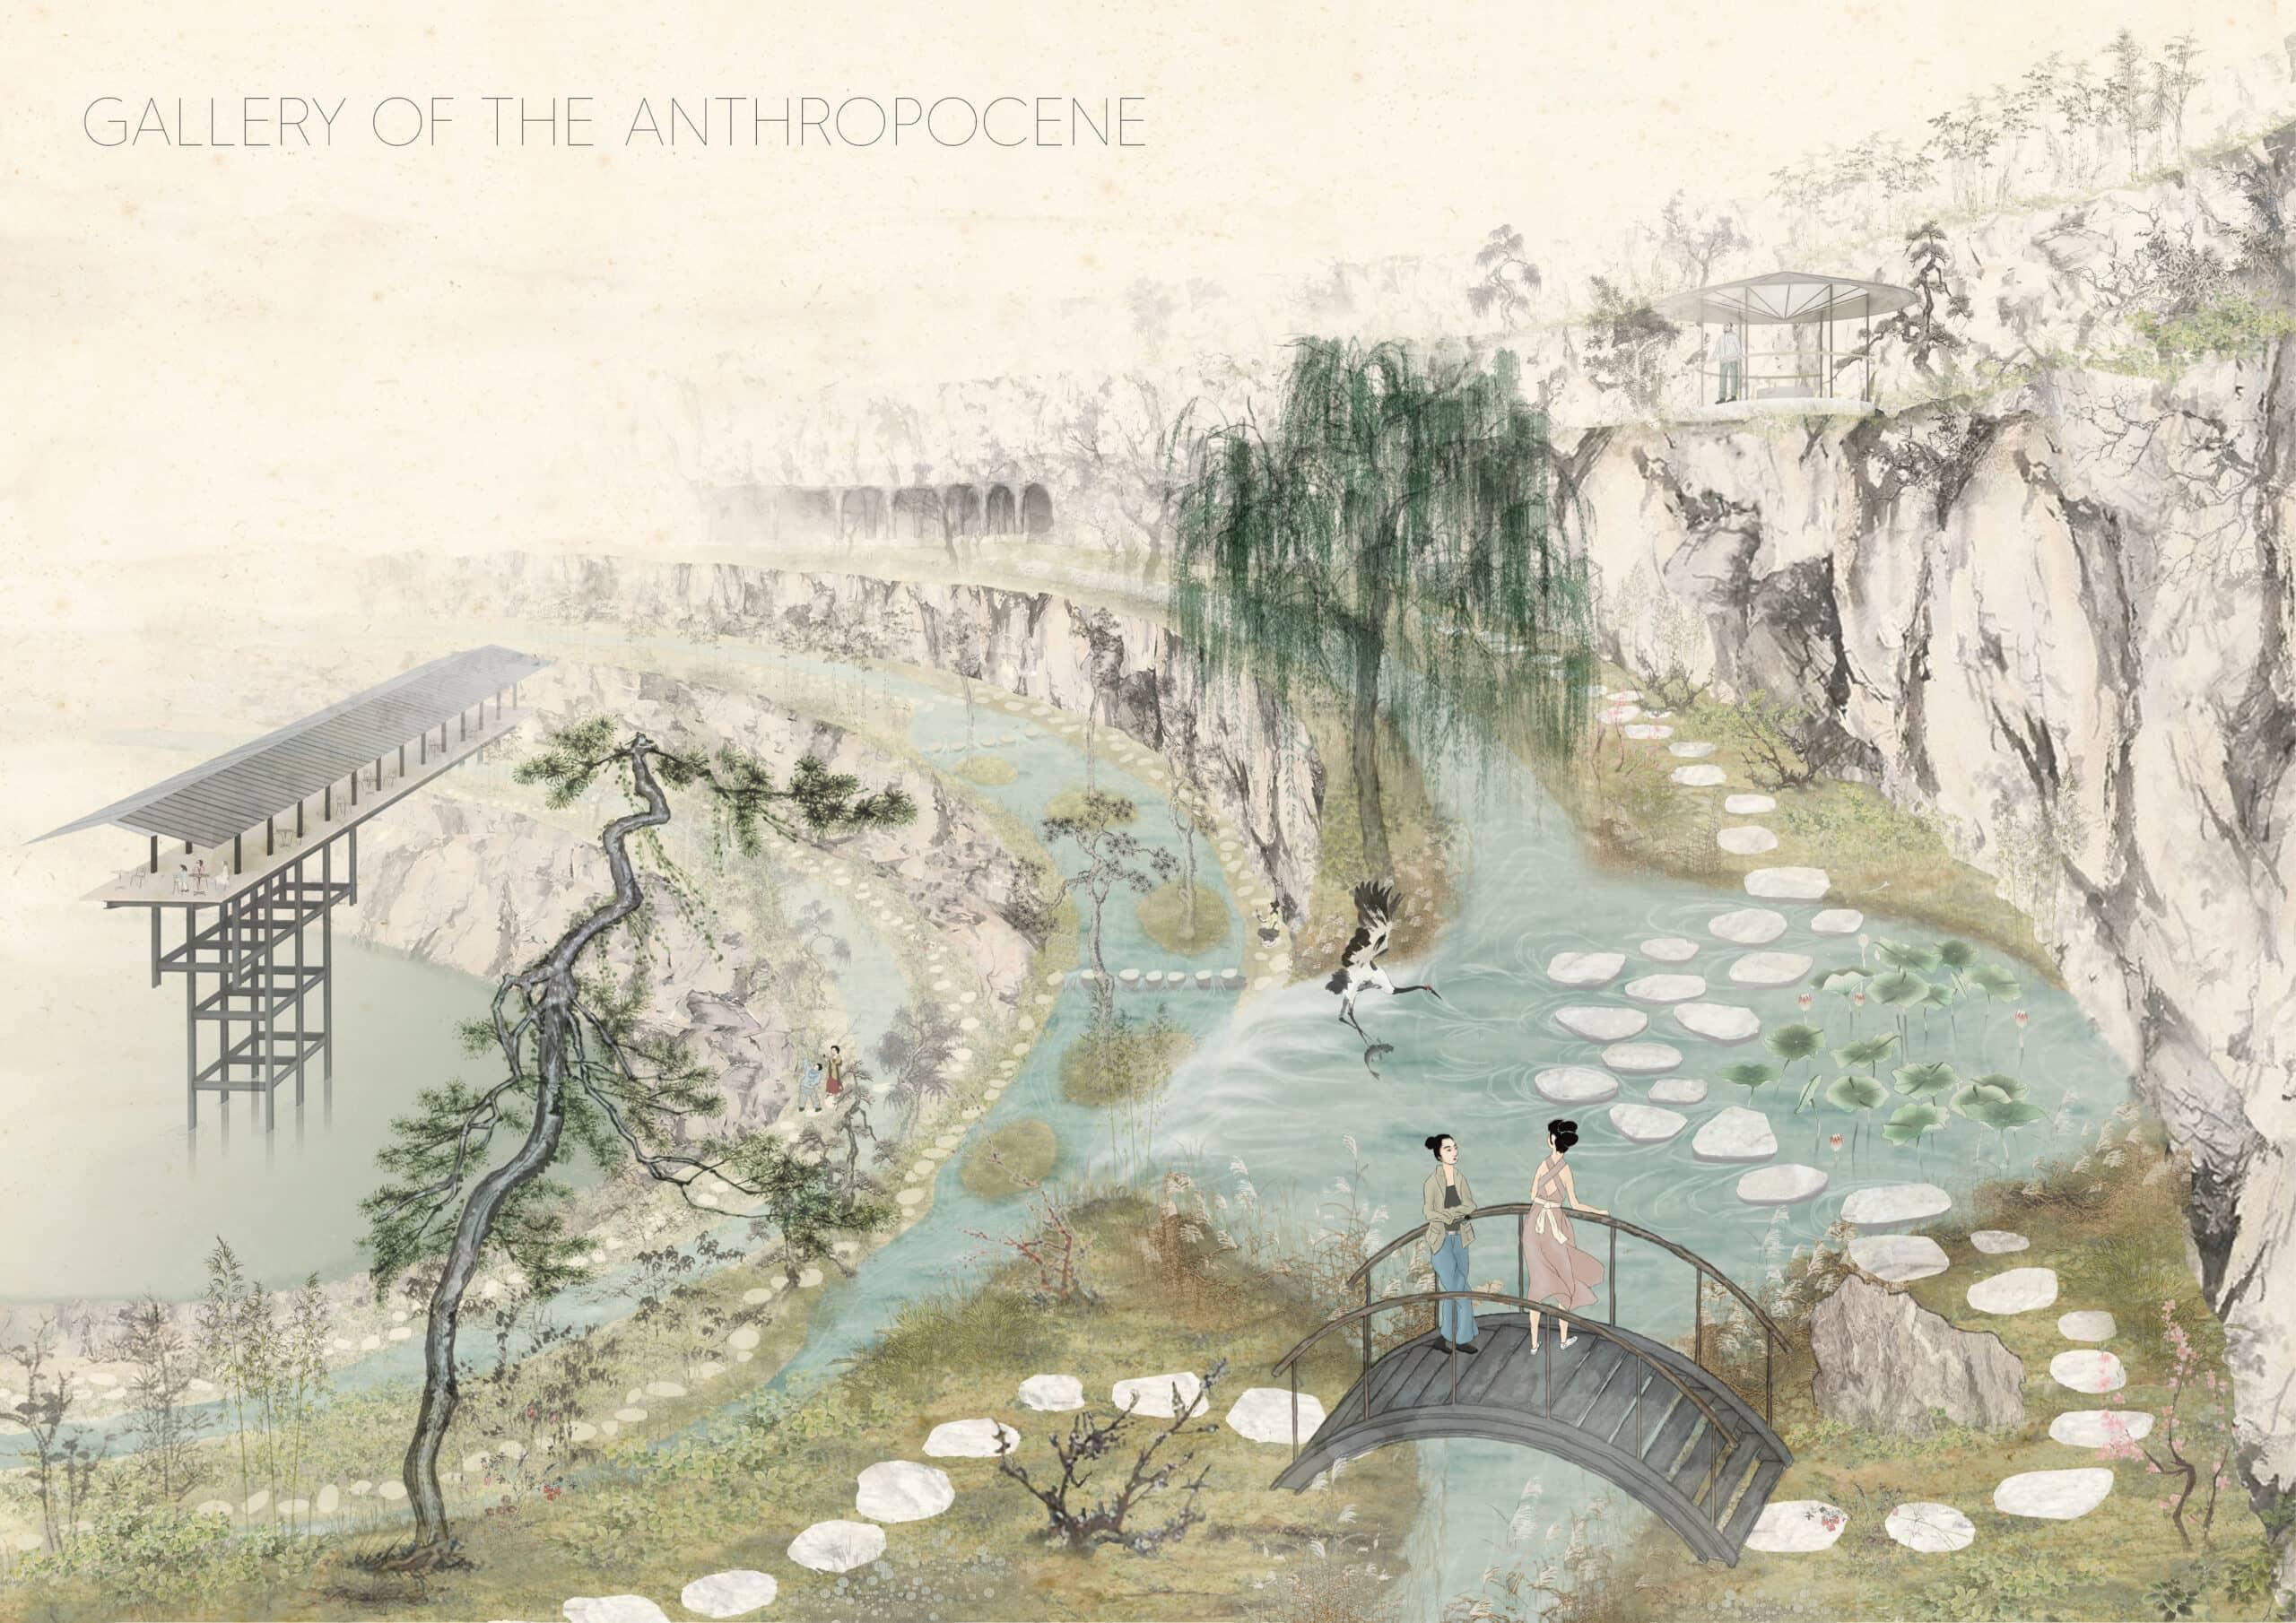 19944_Gallery of the Anthropocene_Presentation